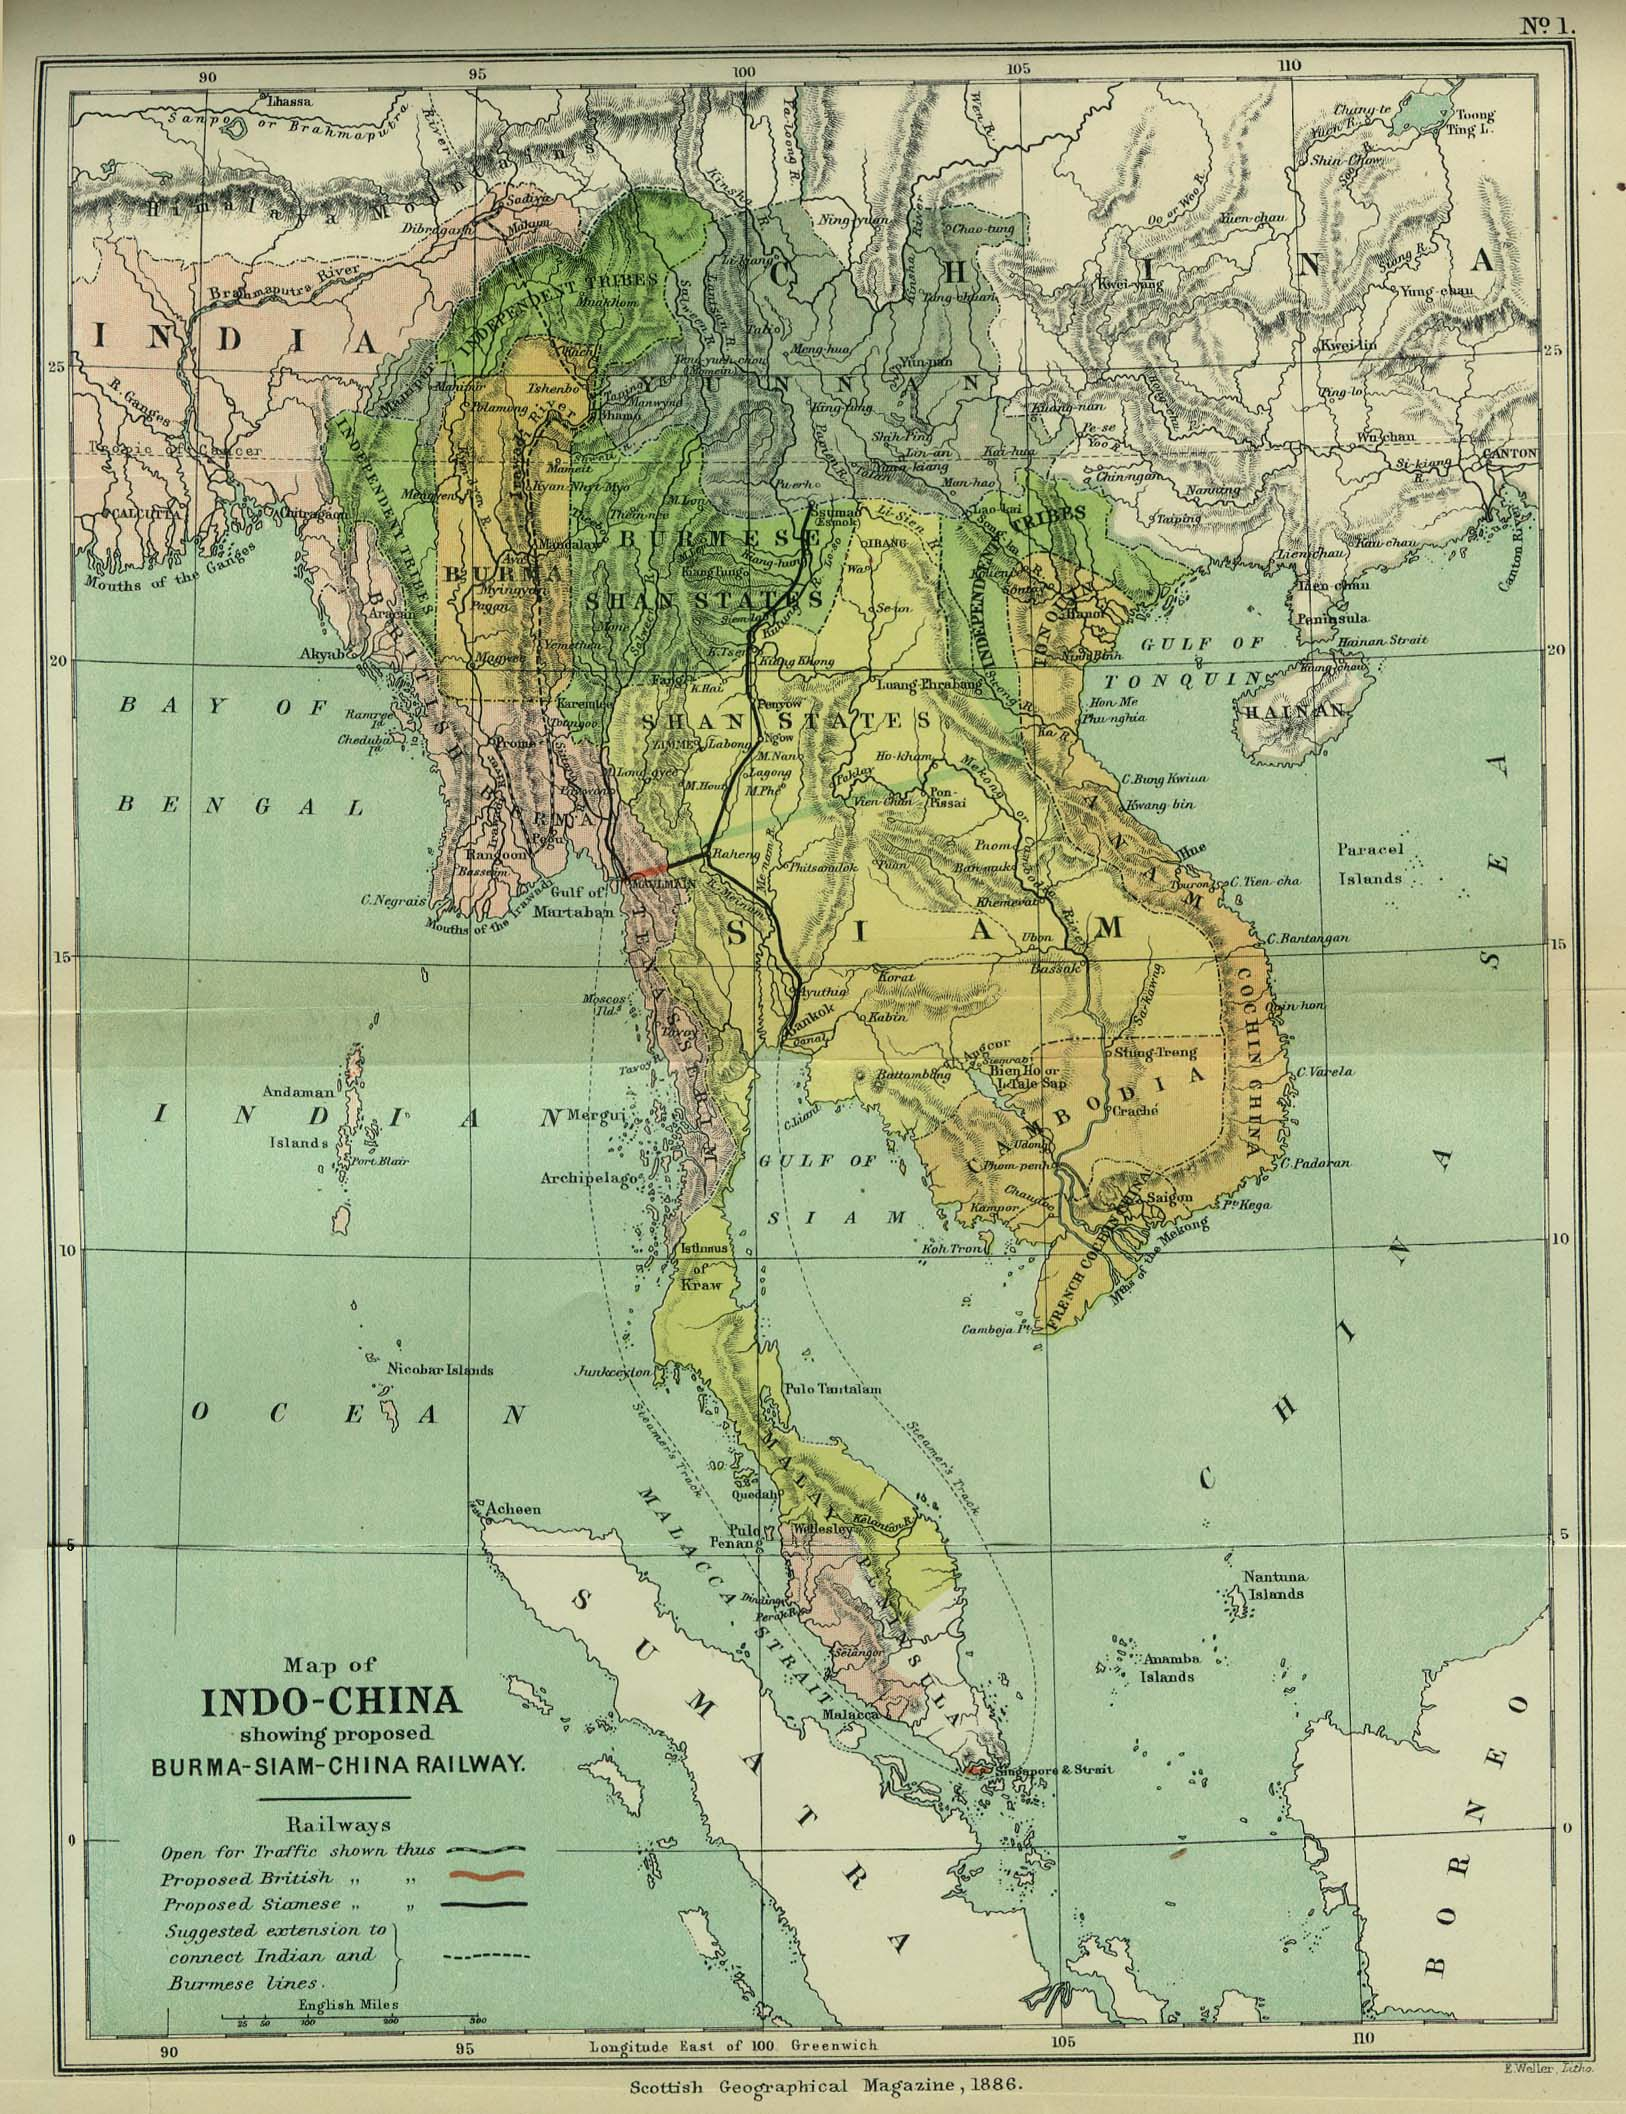 Free burma myanmar maps indo china 1886 gumiabroncs Images